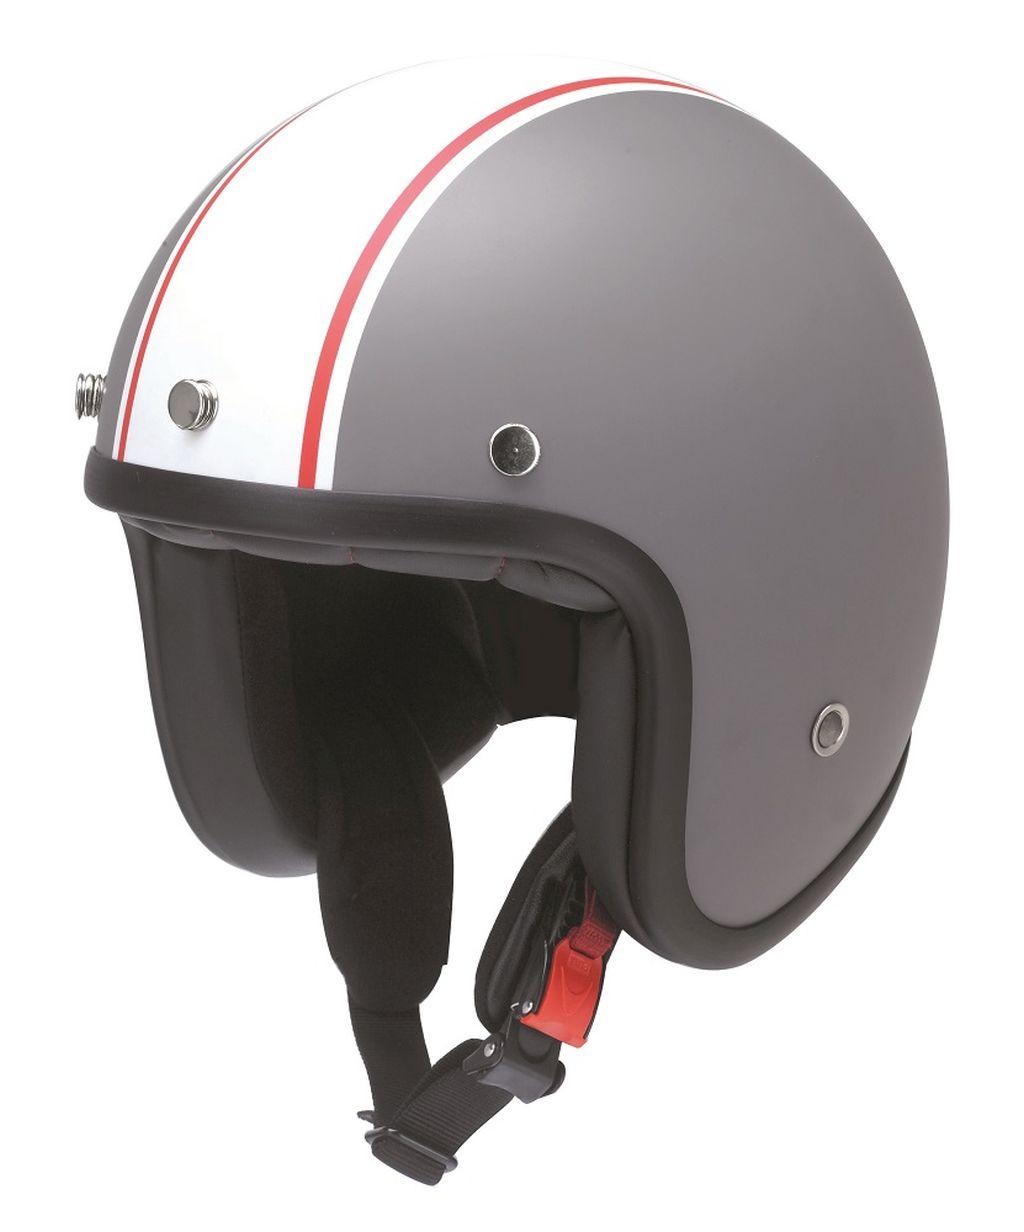 Redbike Motorrad Helm Jethelm Hot Rod Kochmann RB 754 matt-grau weiss XS - XXL